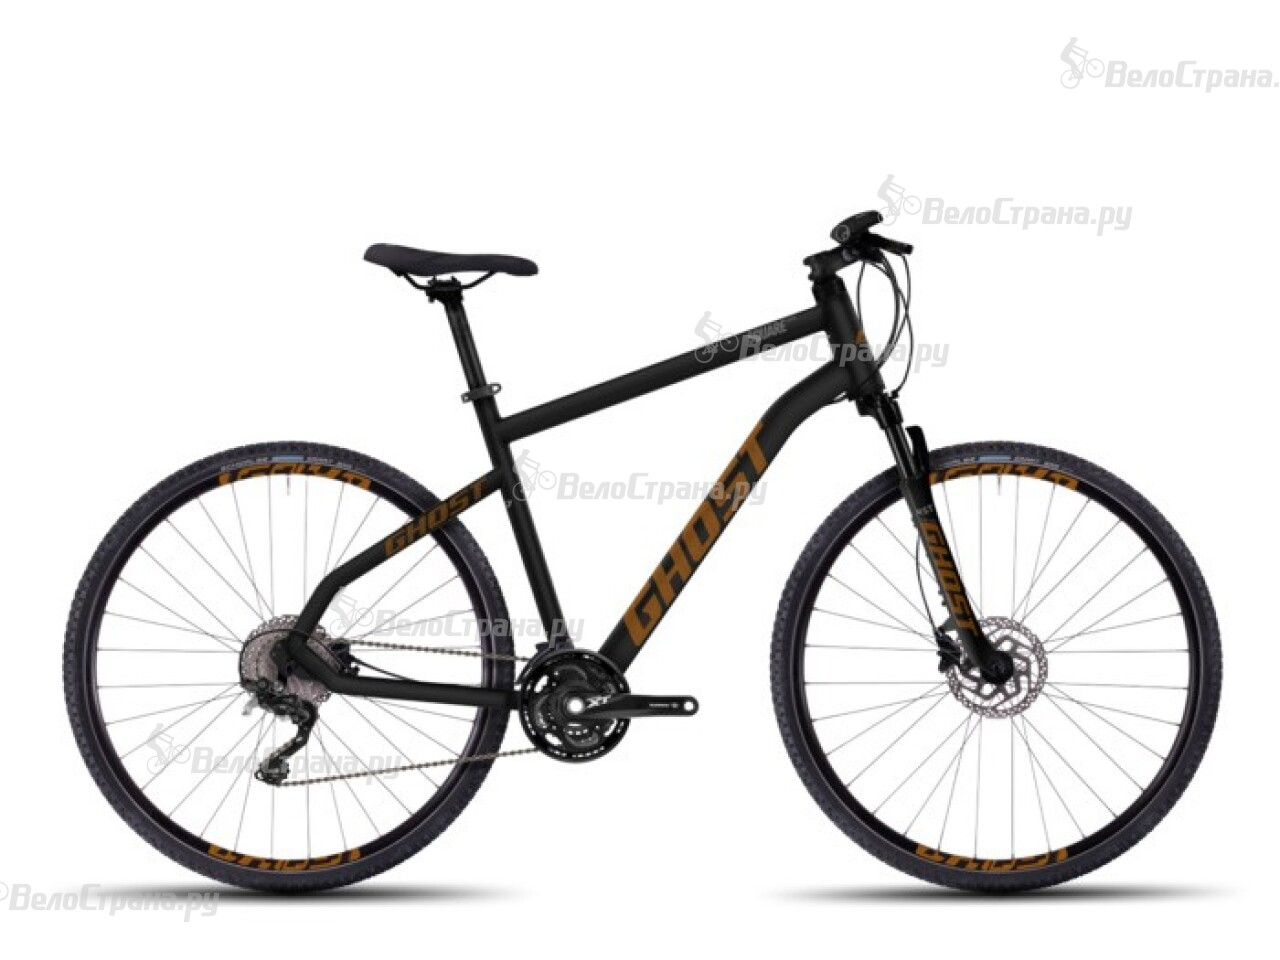 Велосипед Ghost SQUARE Cross 6 (2016) цены онлайн